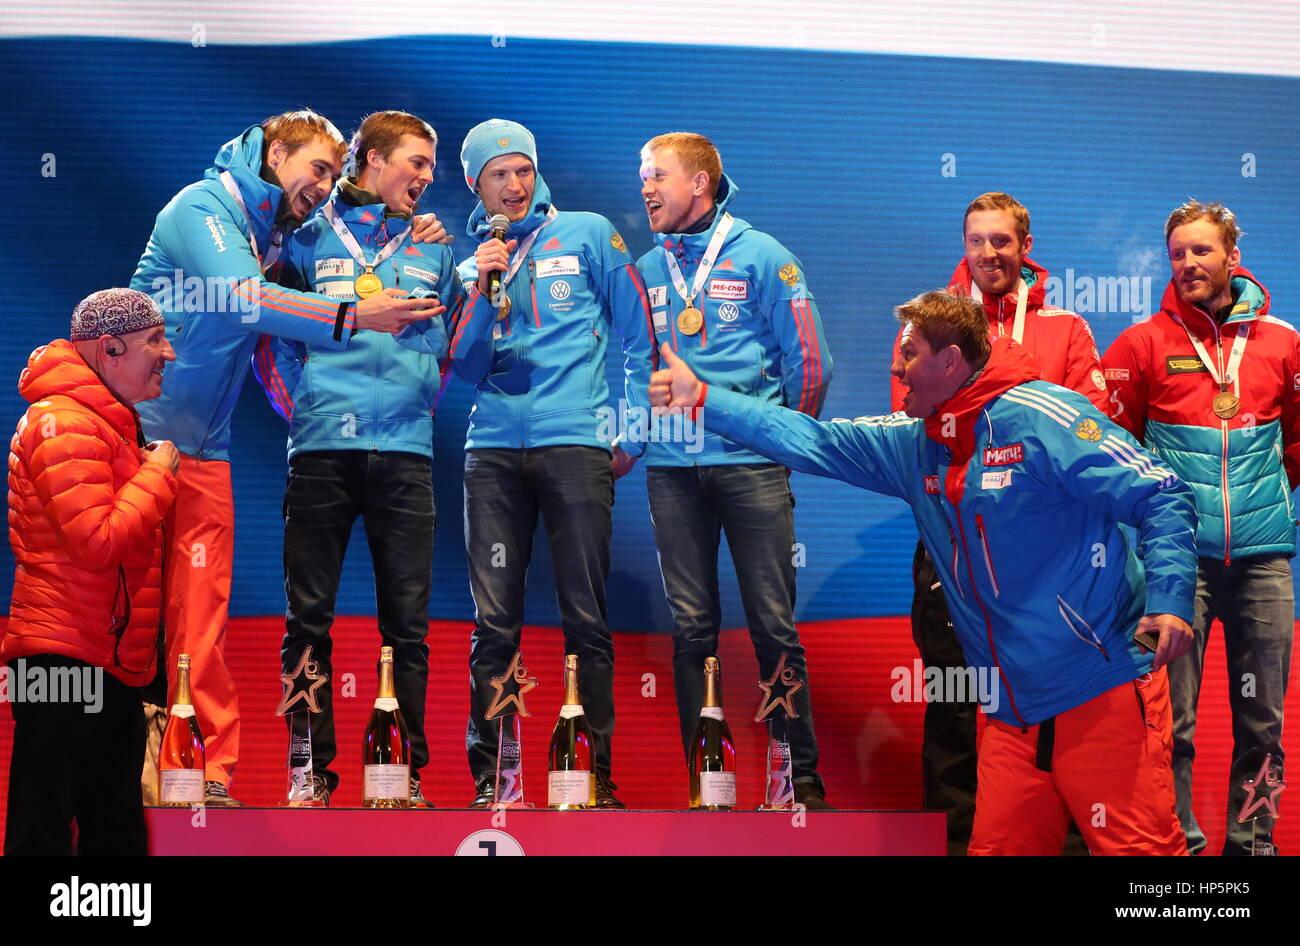 Hochfilzen, Austria. 18th Feb, 2017. Russian TV commentator Dmitry Guberniyev (R front) helps gold medallists Anton - Stock Image